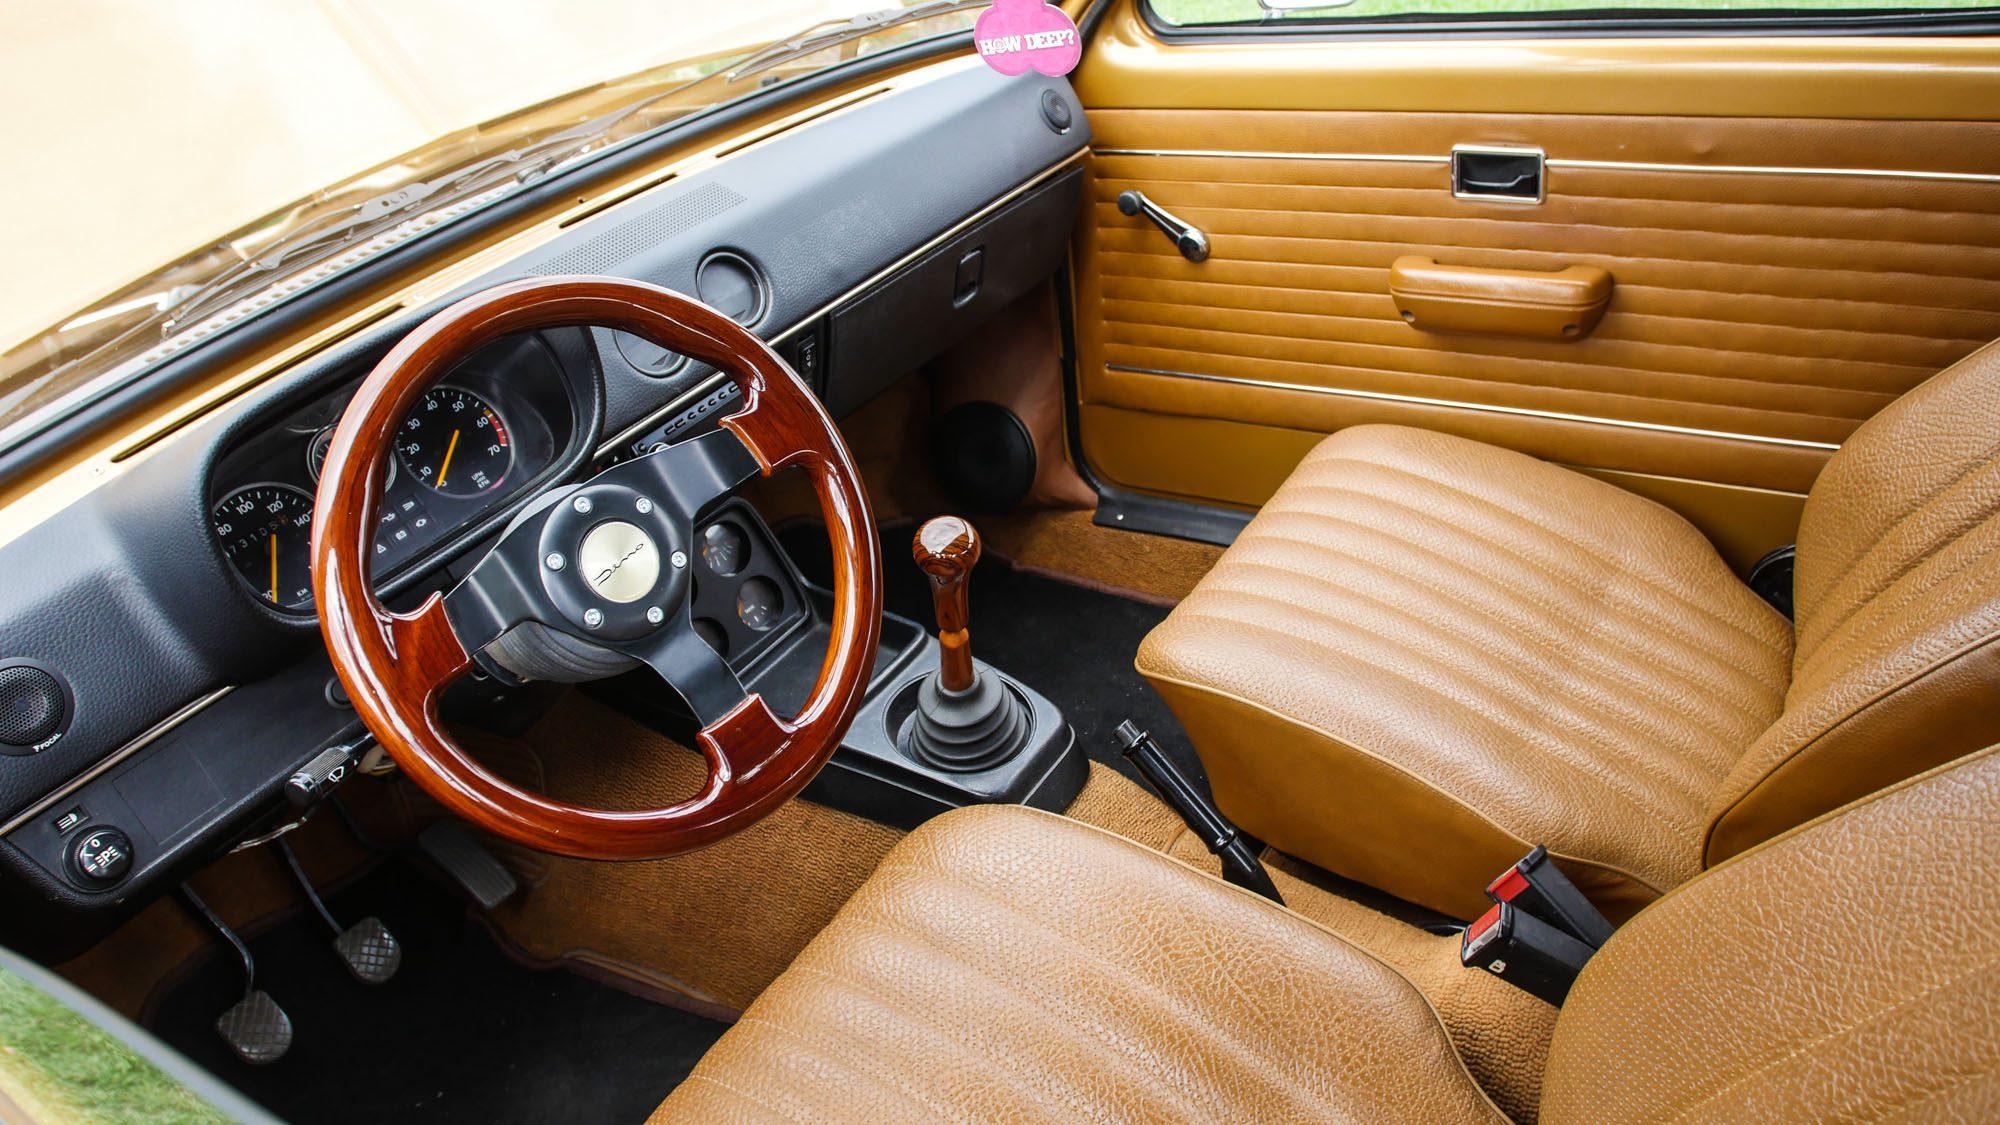 Interieur des Opel Kadett C Caravan